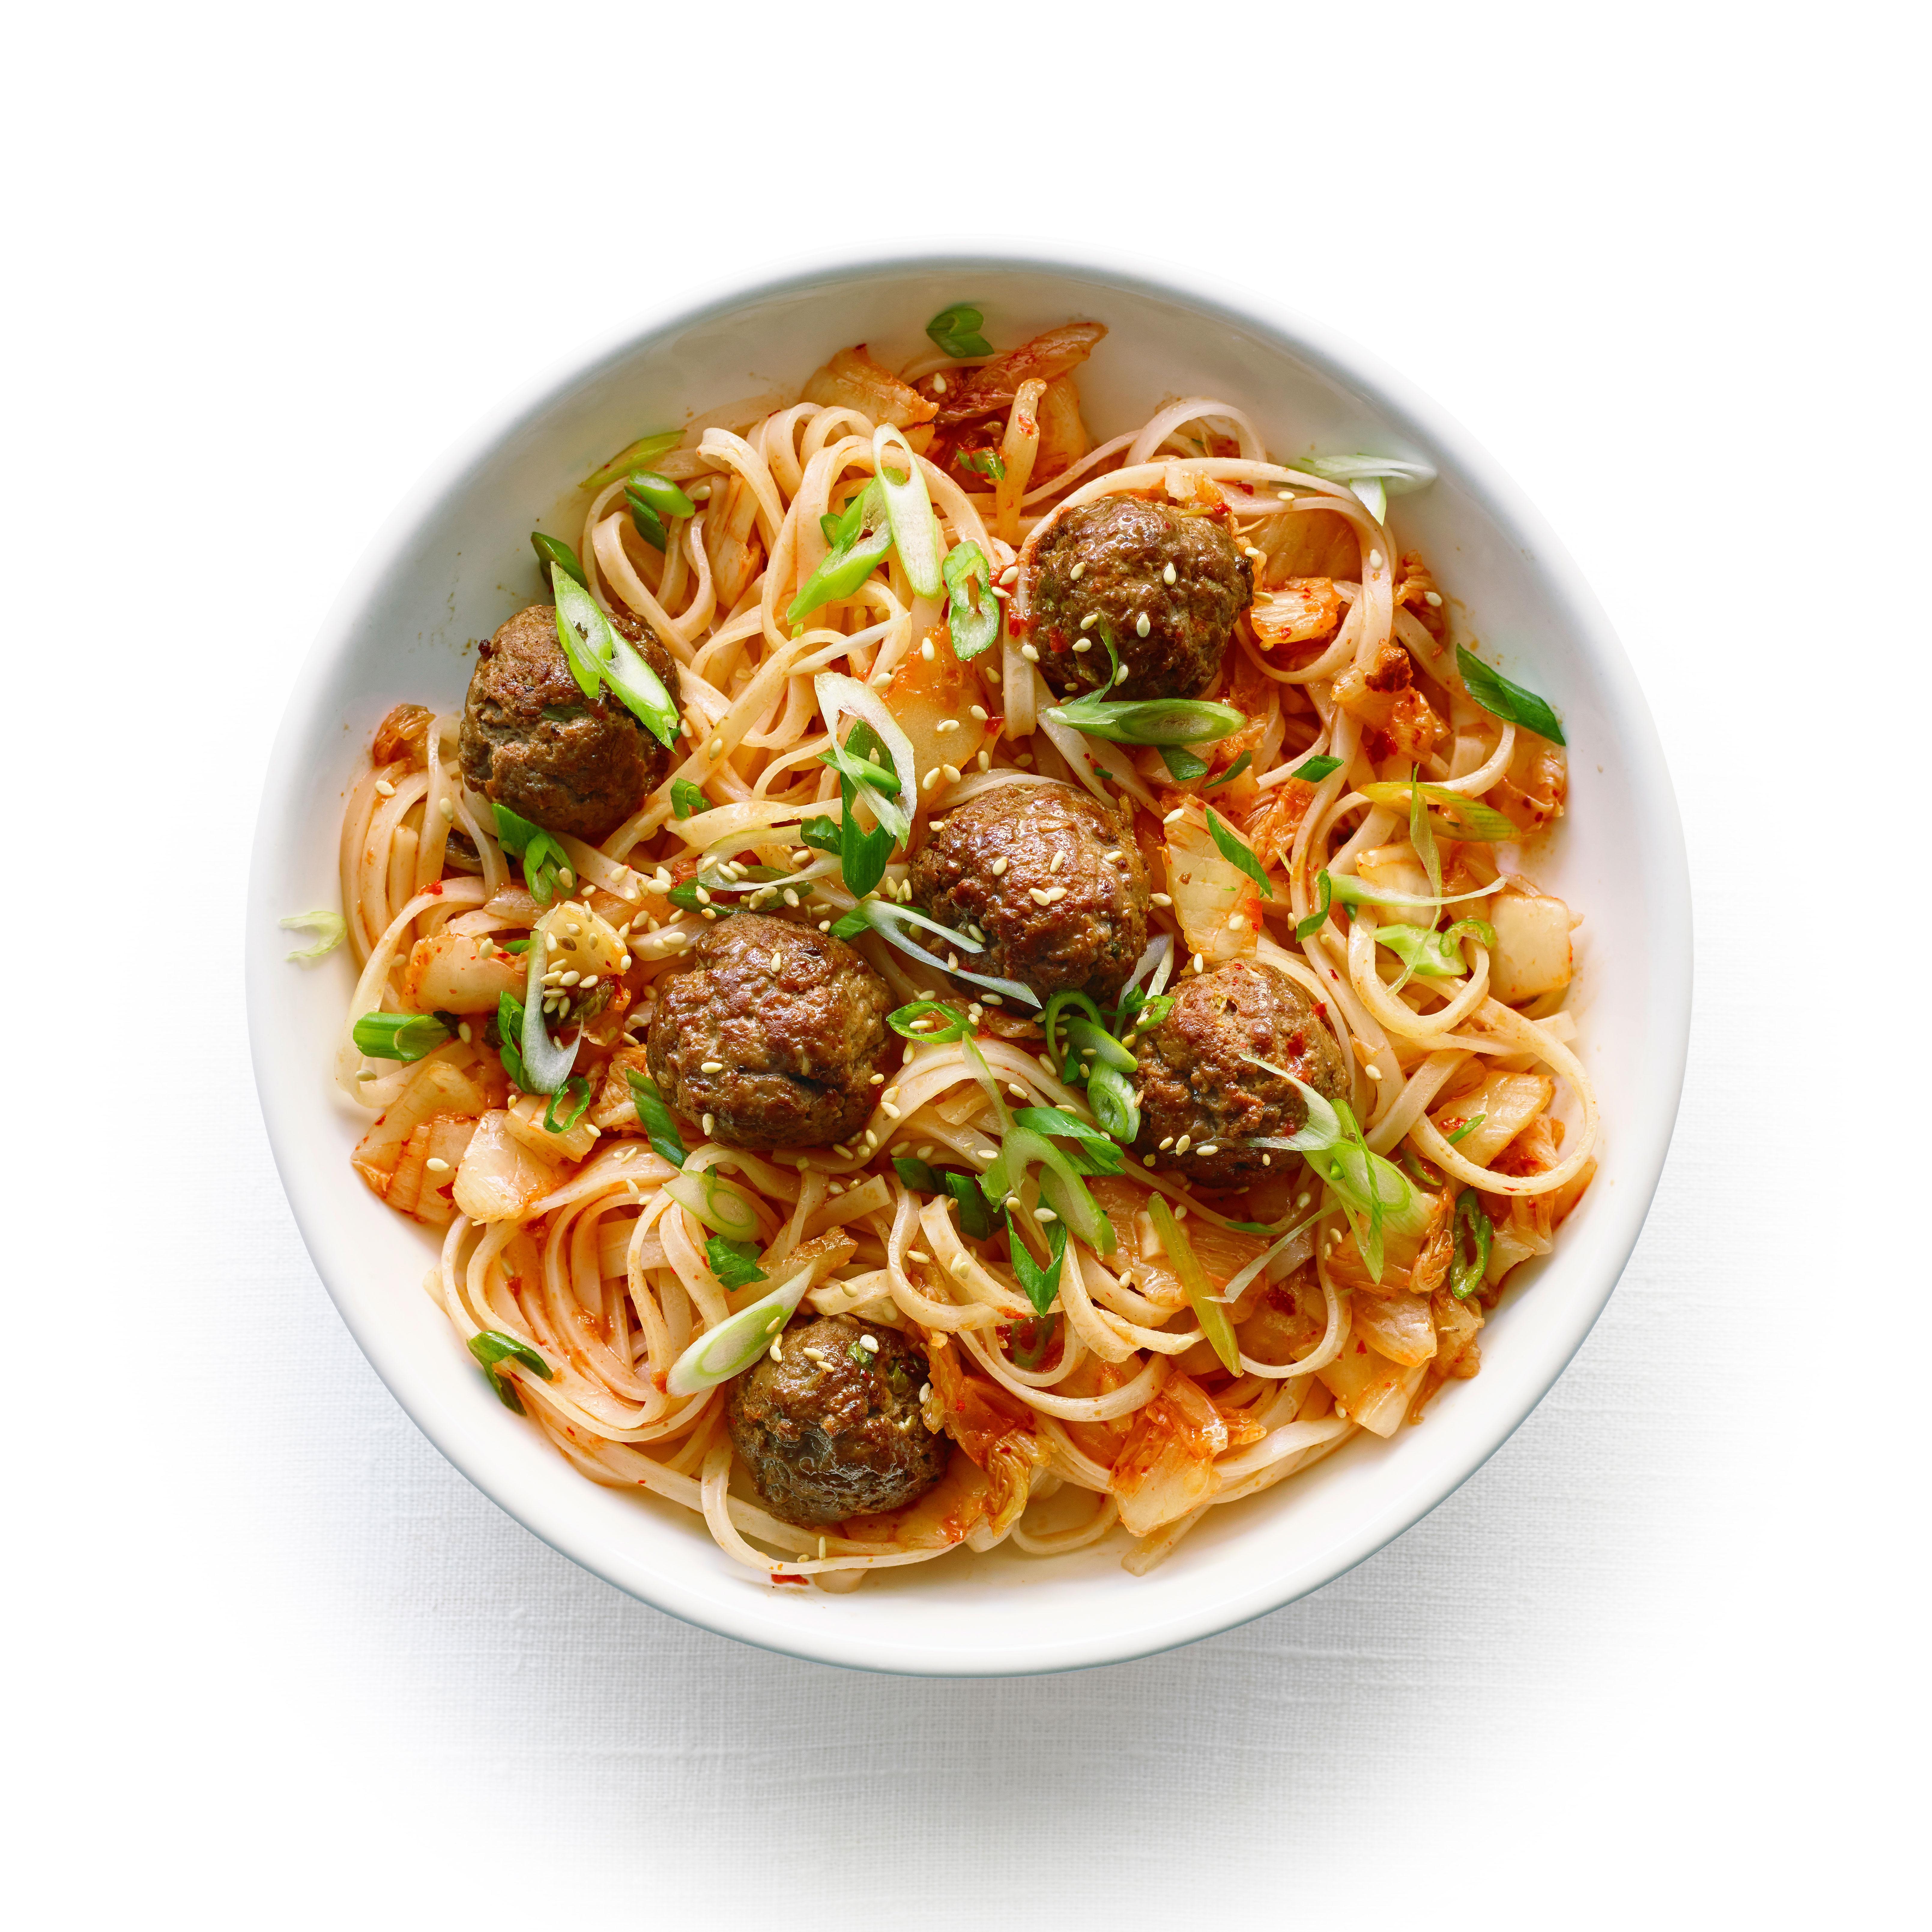 su-Korean Spaghetti and Meatballs Image